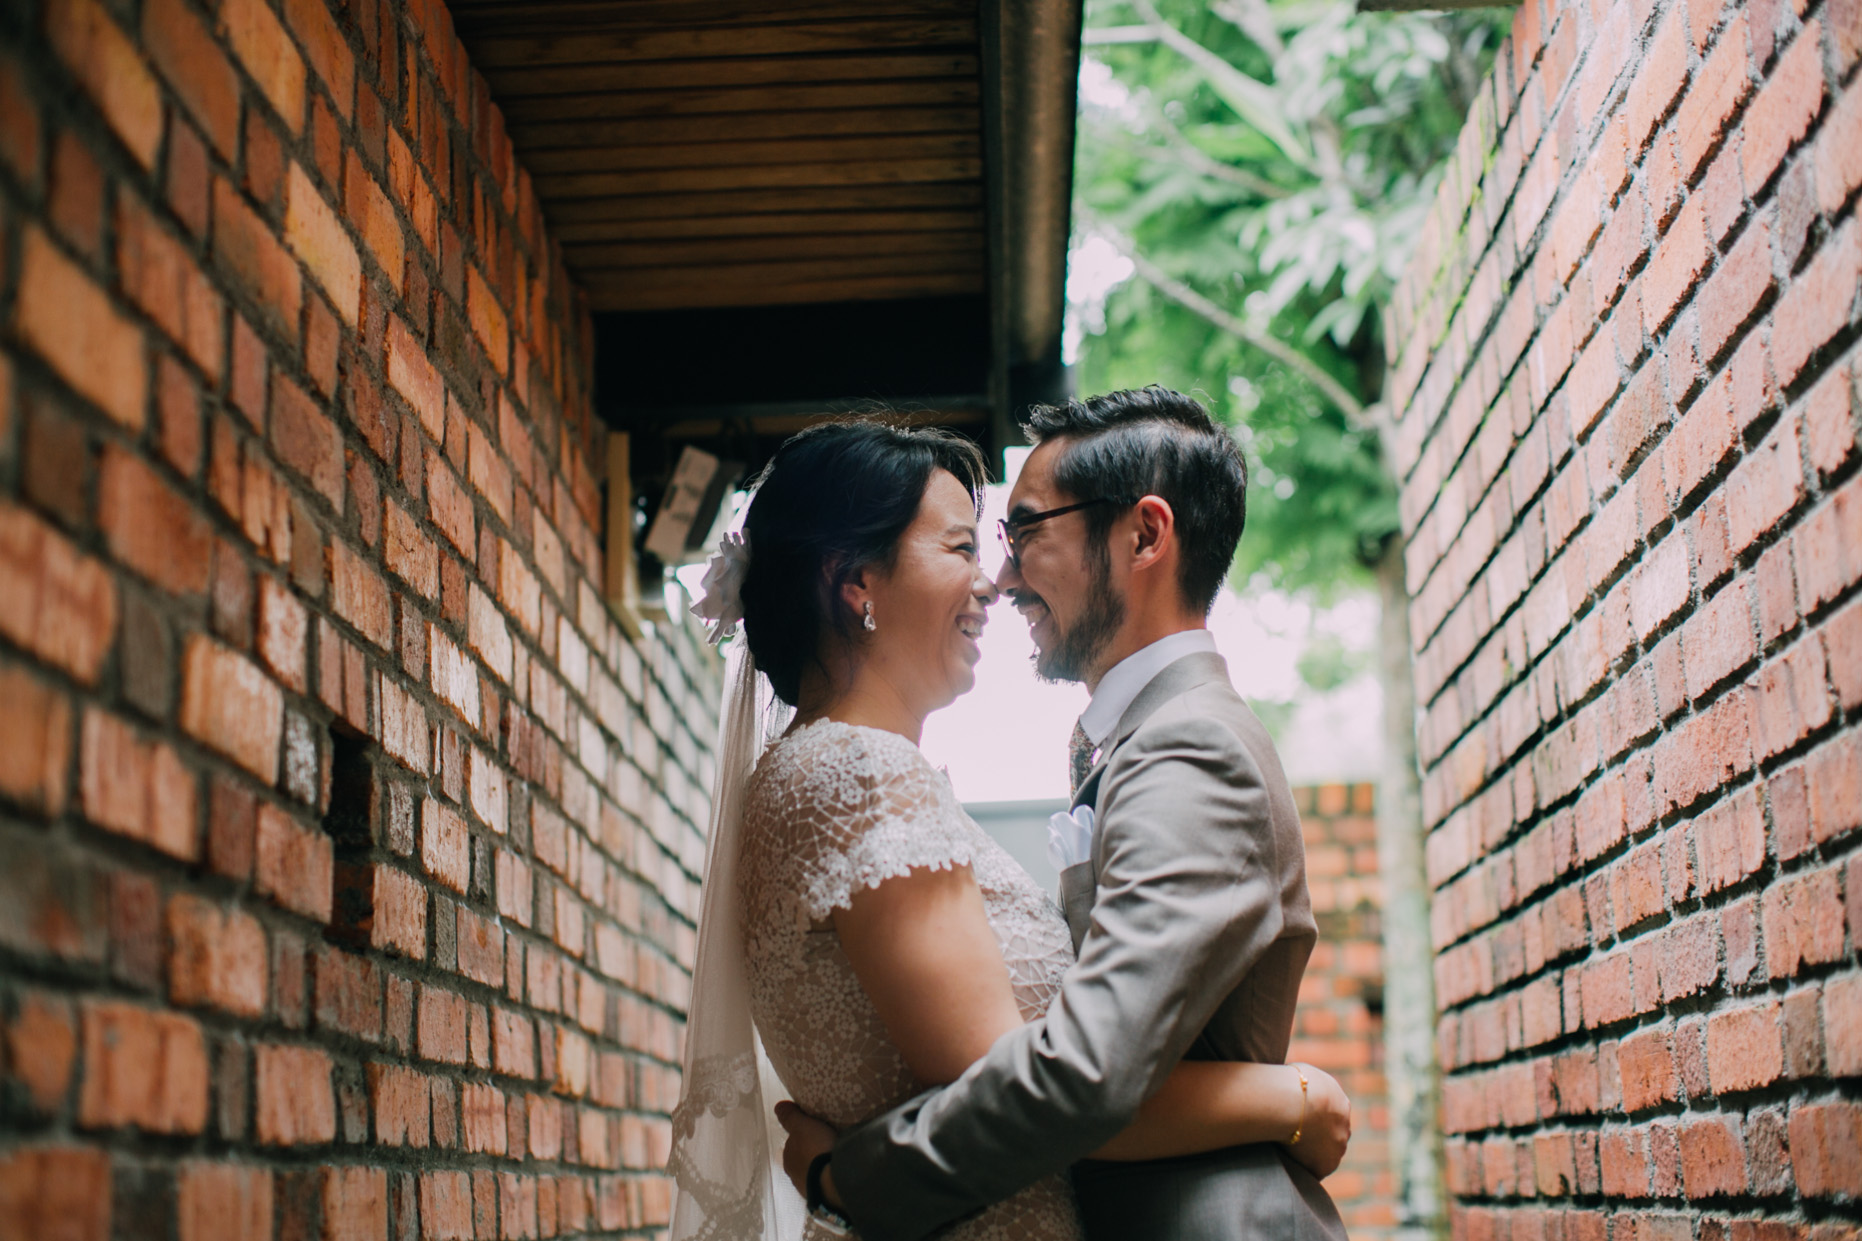 64-hellojanelee-sam grace-malaysia-wedding-day